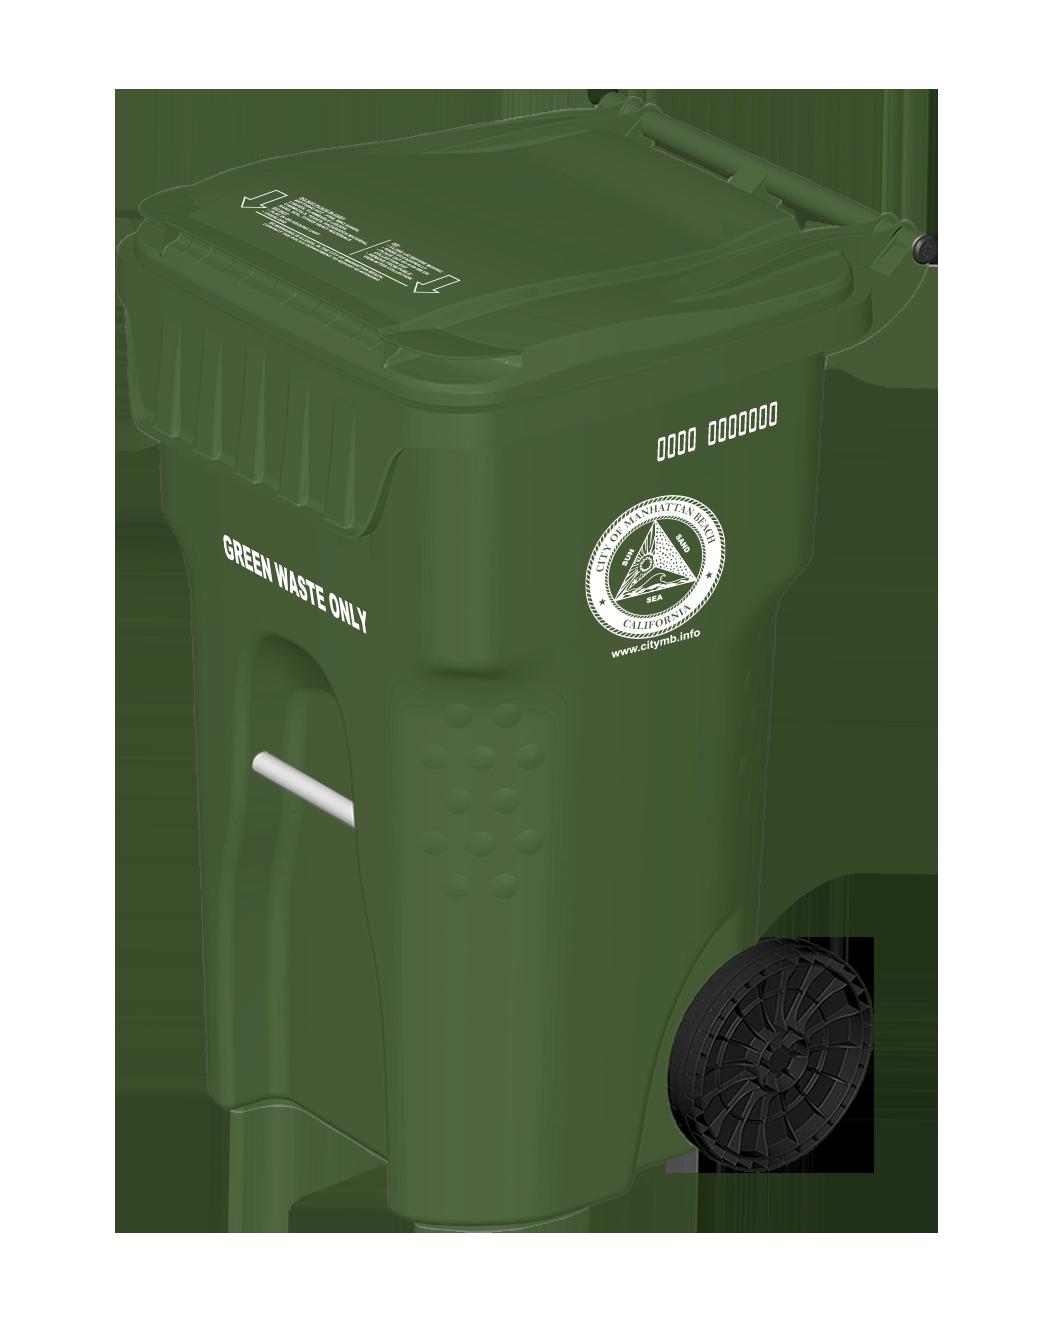 Garbage clipart plastic wrapper. Basic service waste management